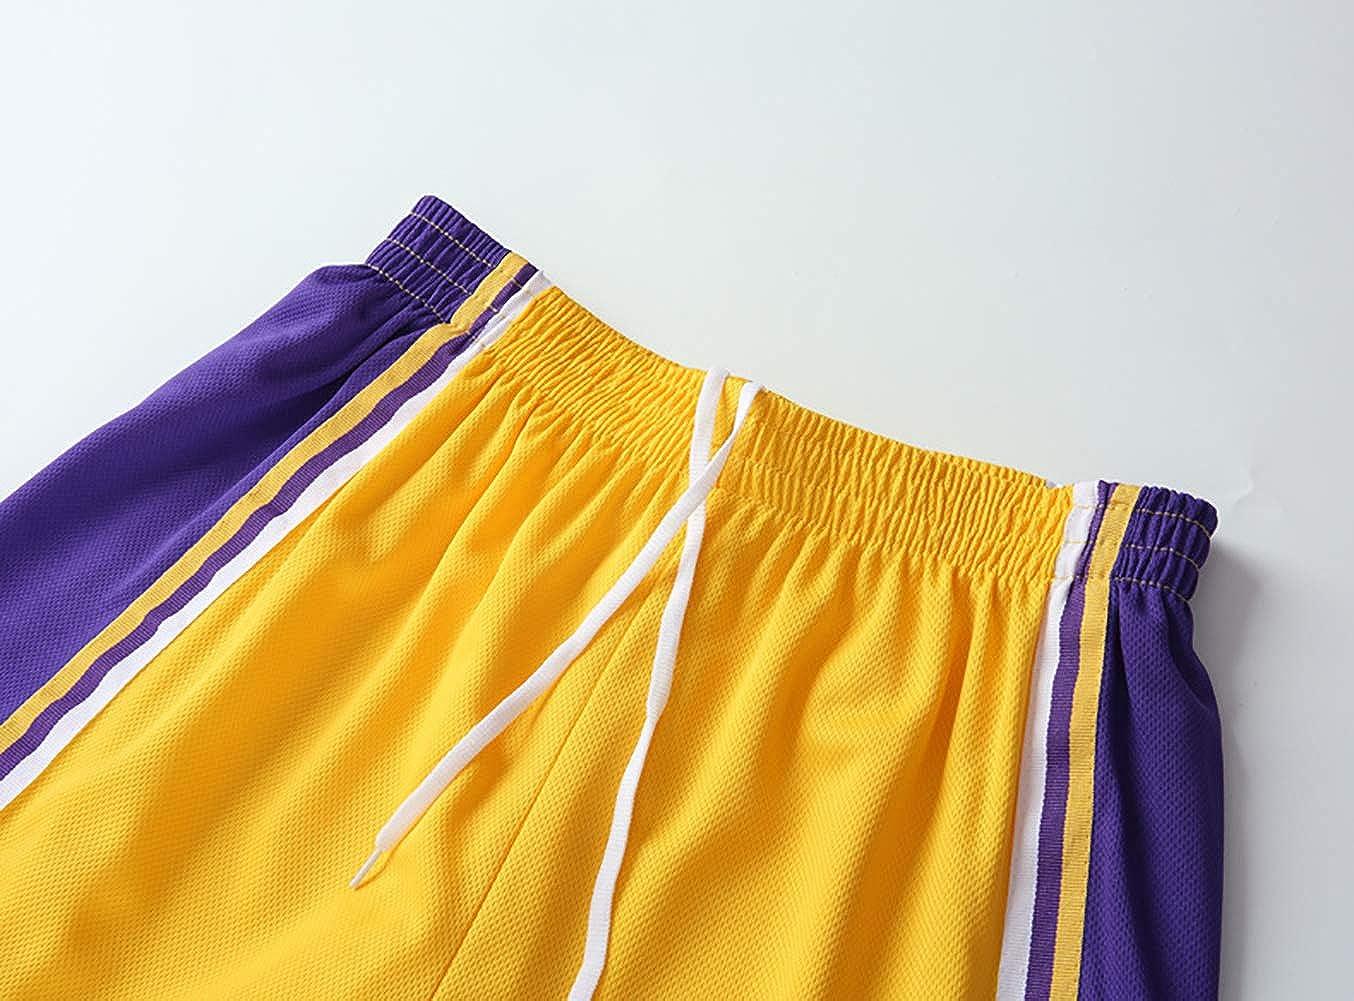 Kurze Hosen Kleidung Set YIAIYW Lakers James No Basketball Sportweste Top 23 Trikot